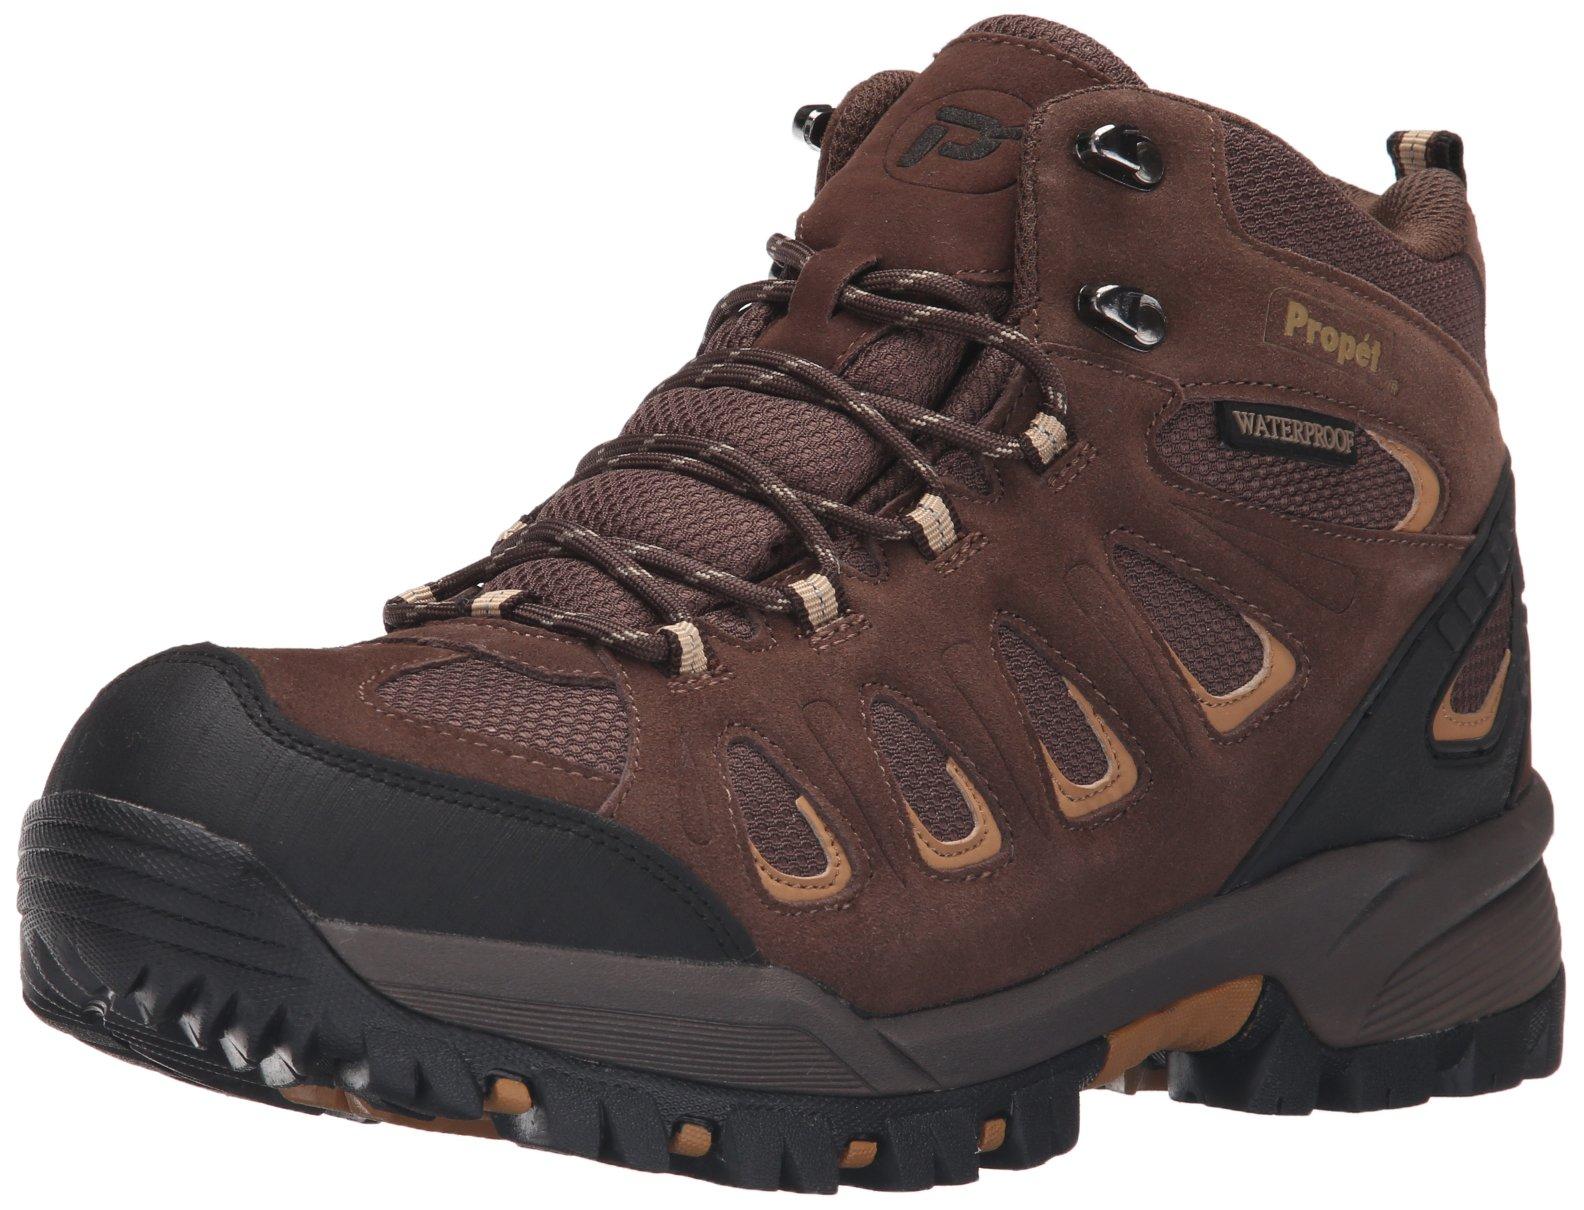 Propet Men's Ridge Walker Hiking Boot, Ridge Walker, 10 5E US by Propét